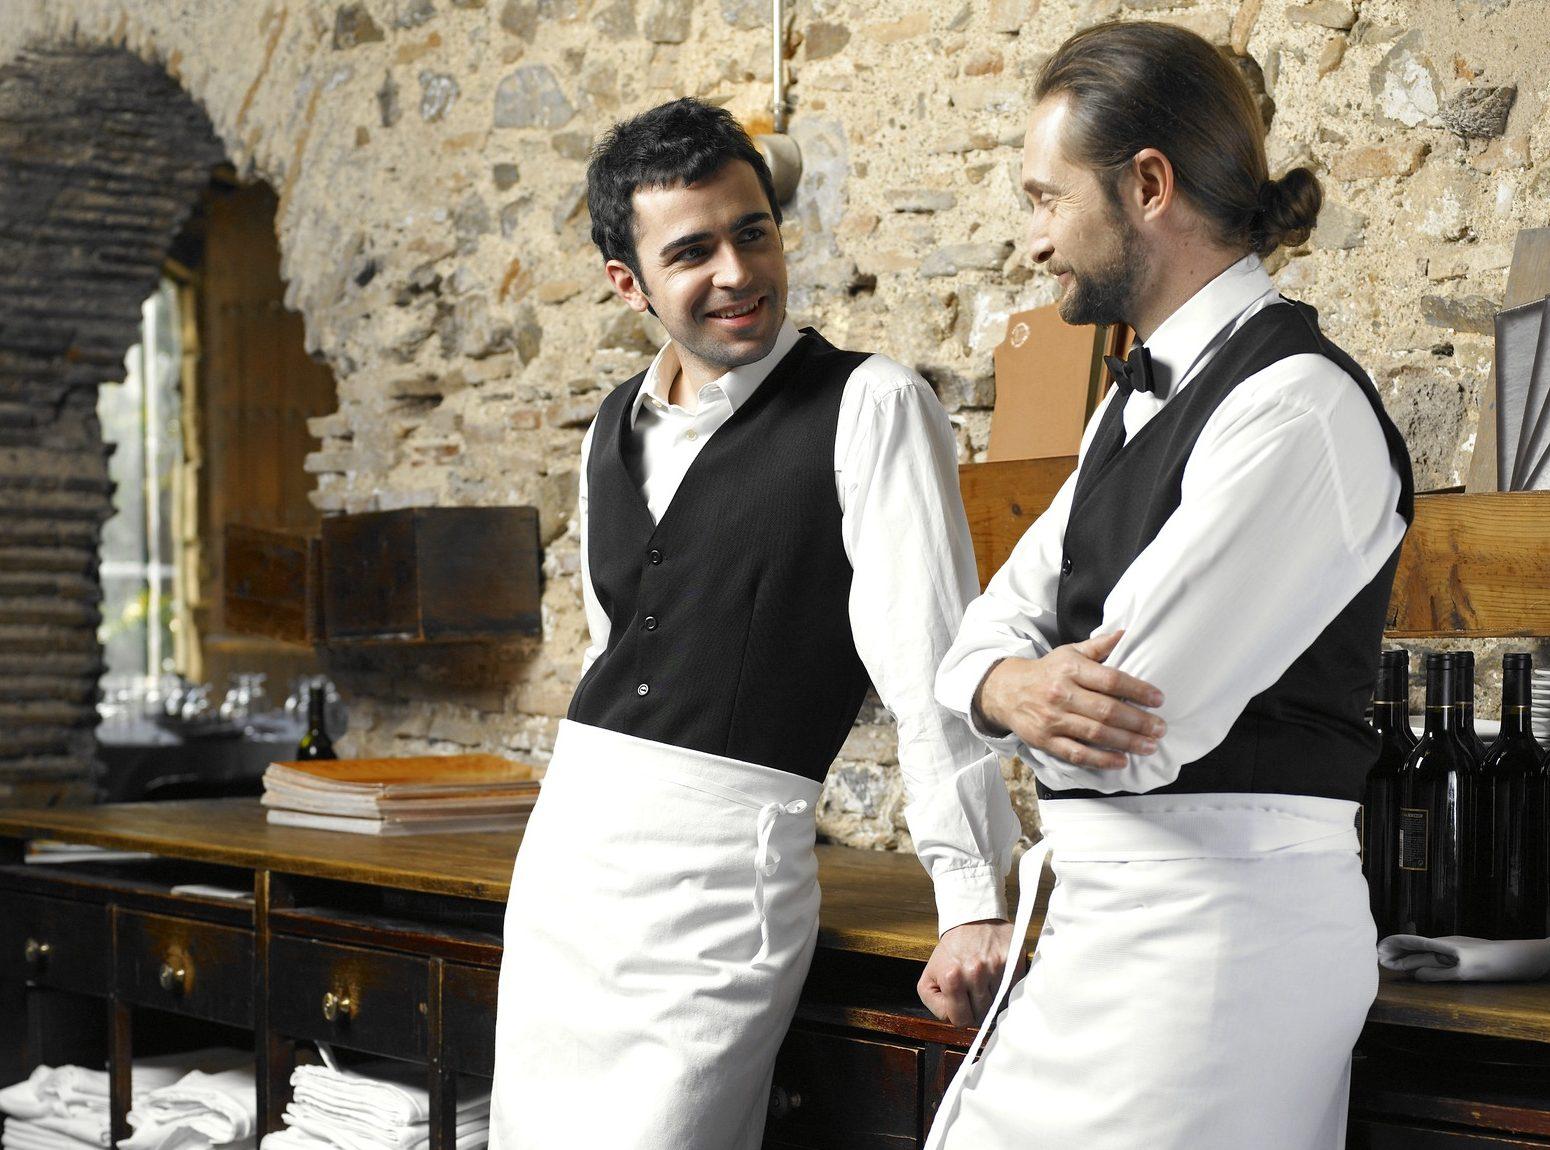 Two waiters talking in restaurant